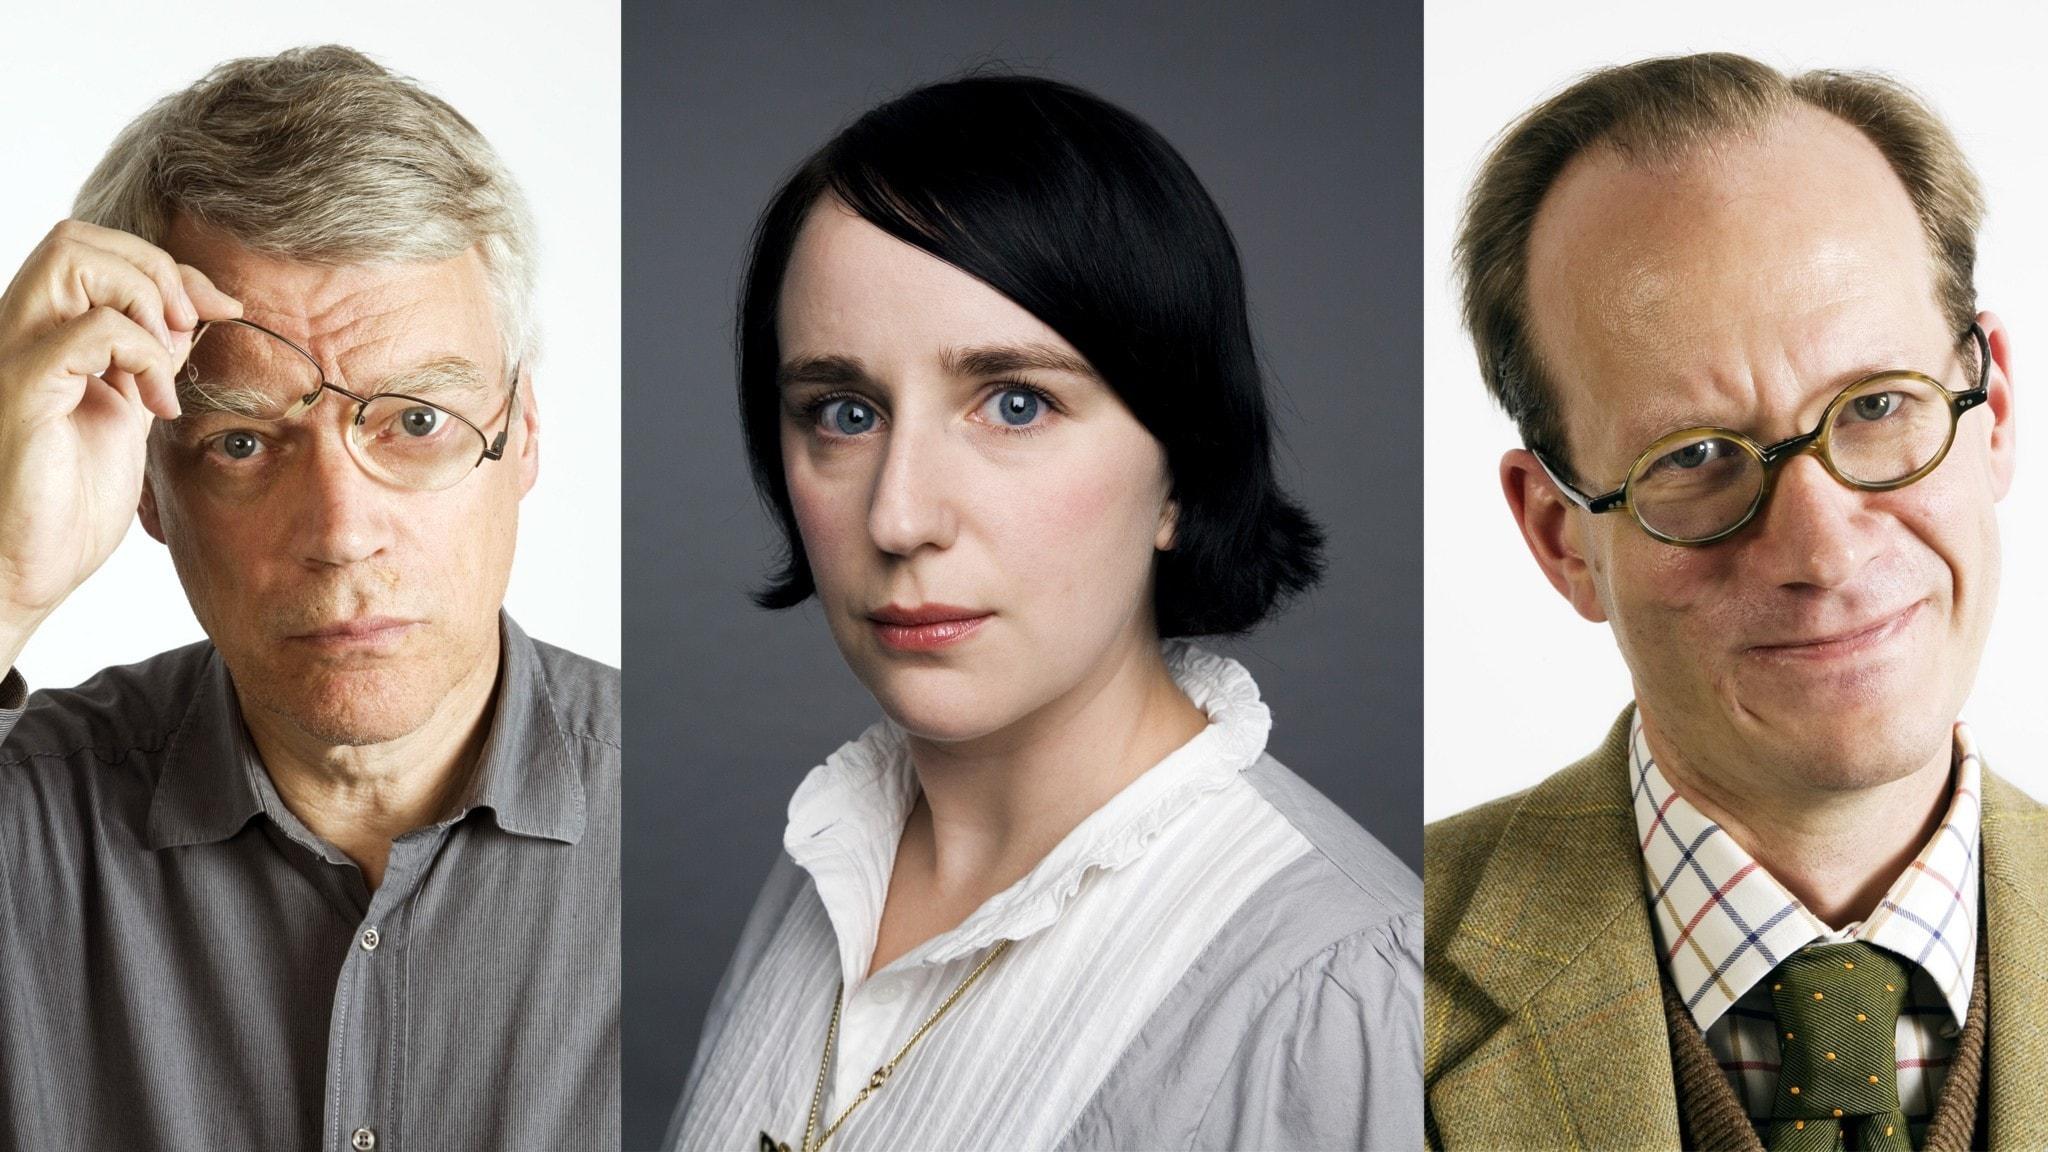 Jonas Hallberg, Hanna Fahl och Johan Hakelius. Foto Mattias Ahlm Sveriges Radio